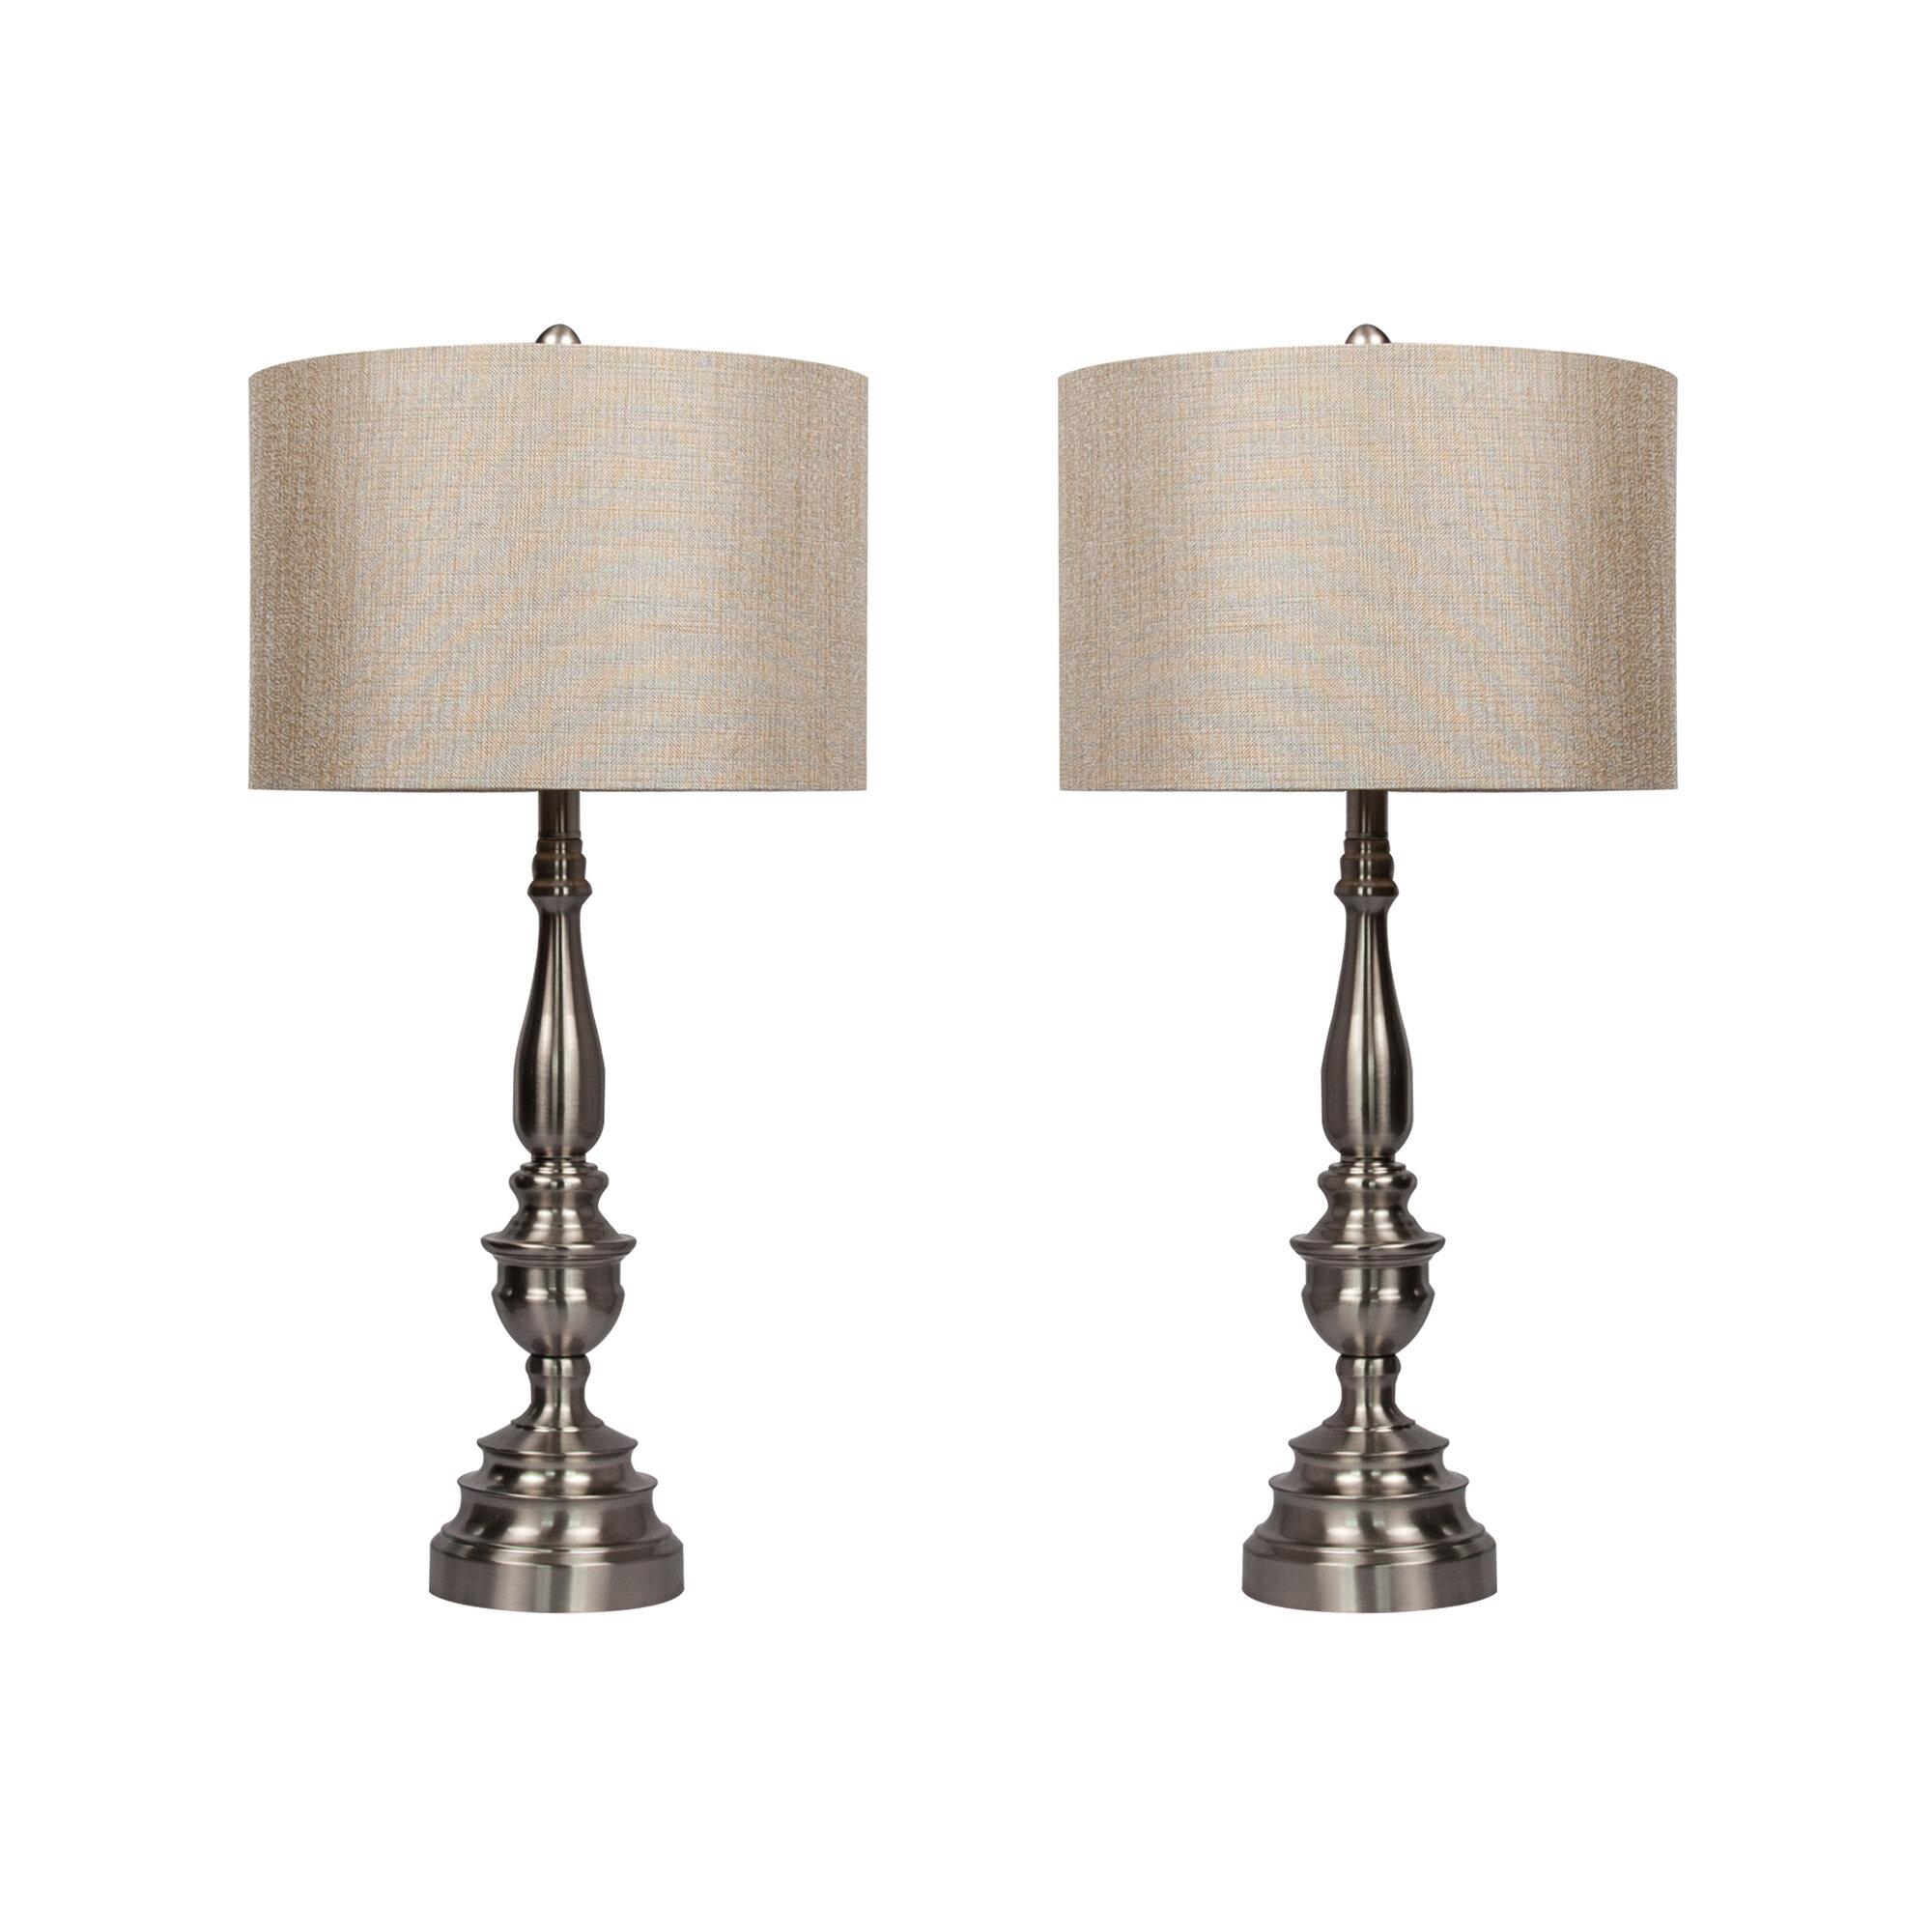 Charlton home truman 29 5 table lamp reviews wayfair